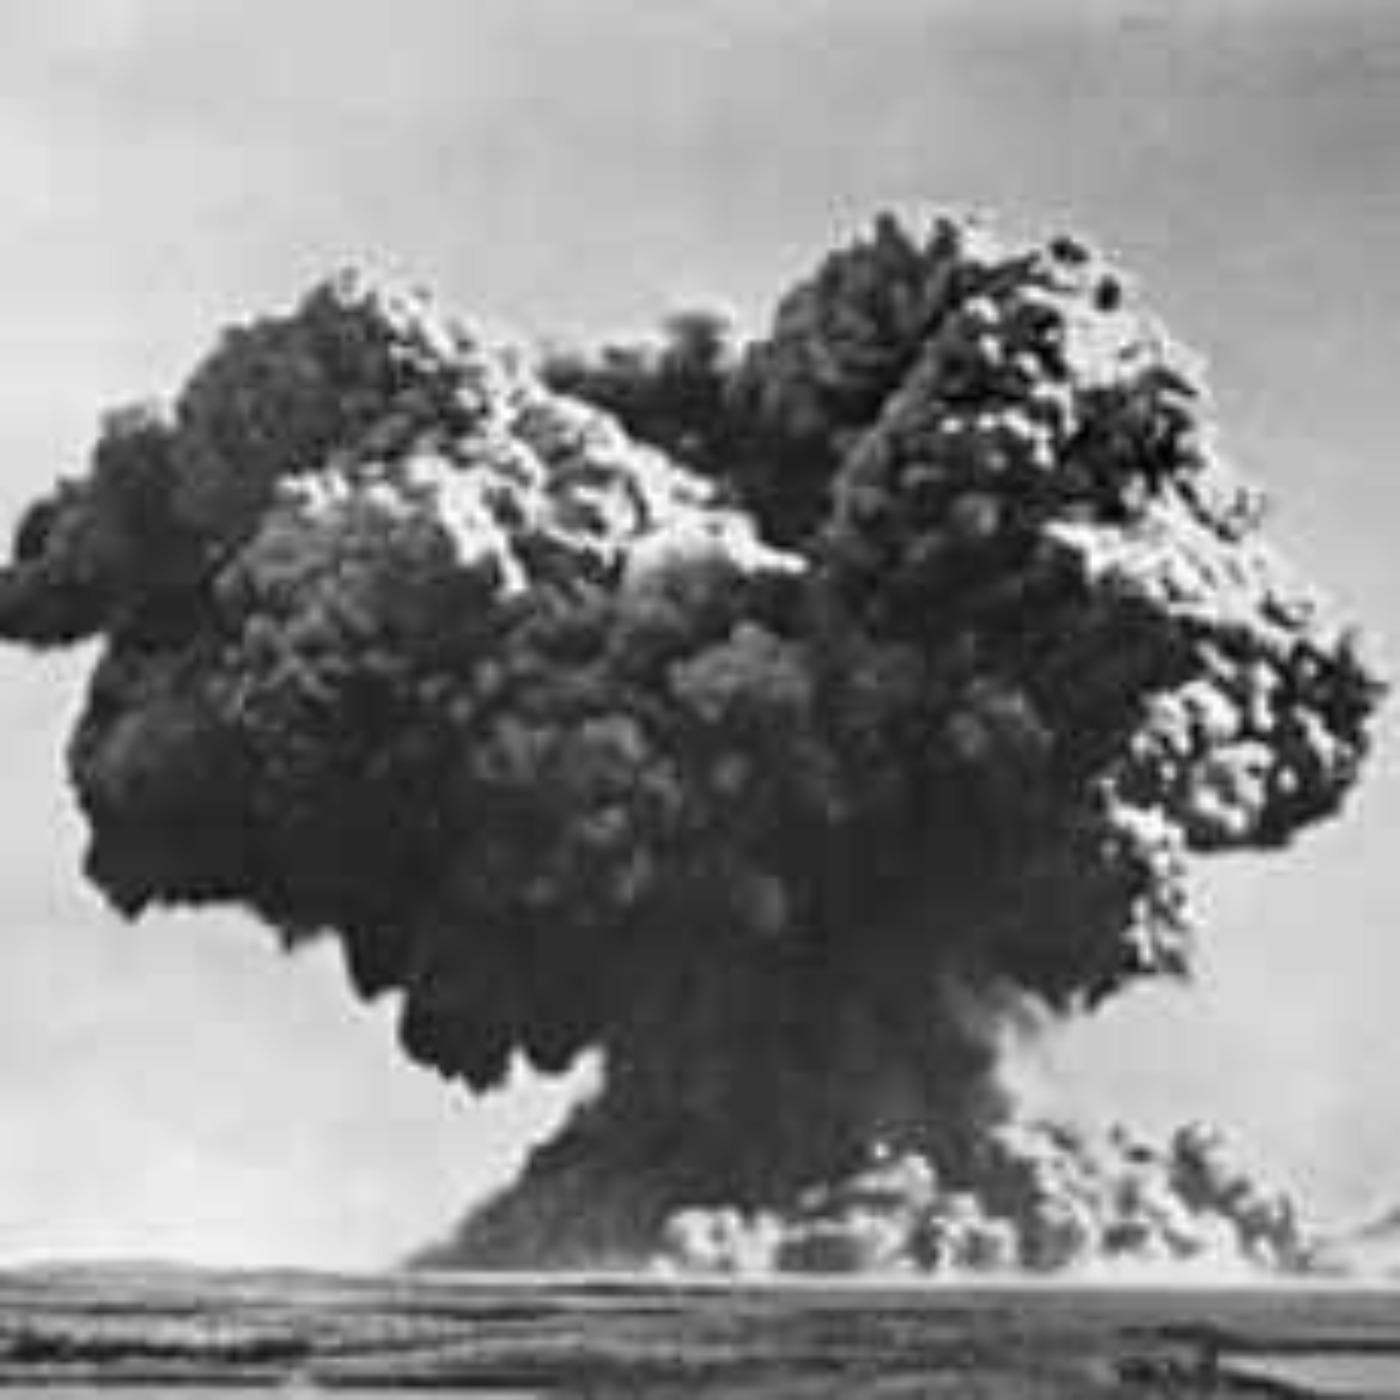 Cauliflower and Plym: Britain's First Atomic Bomb